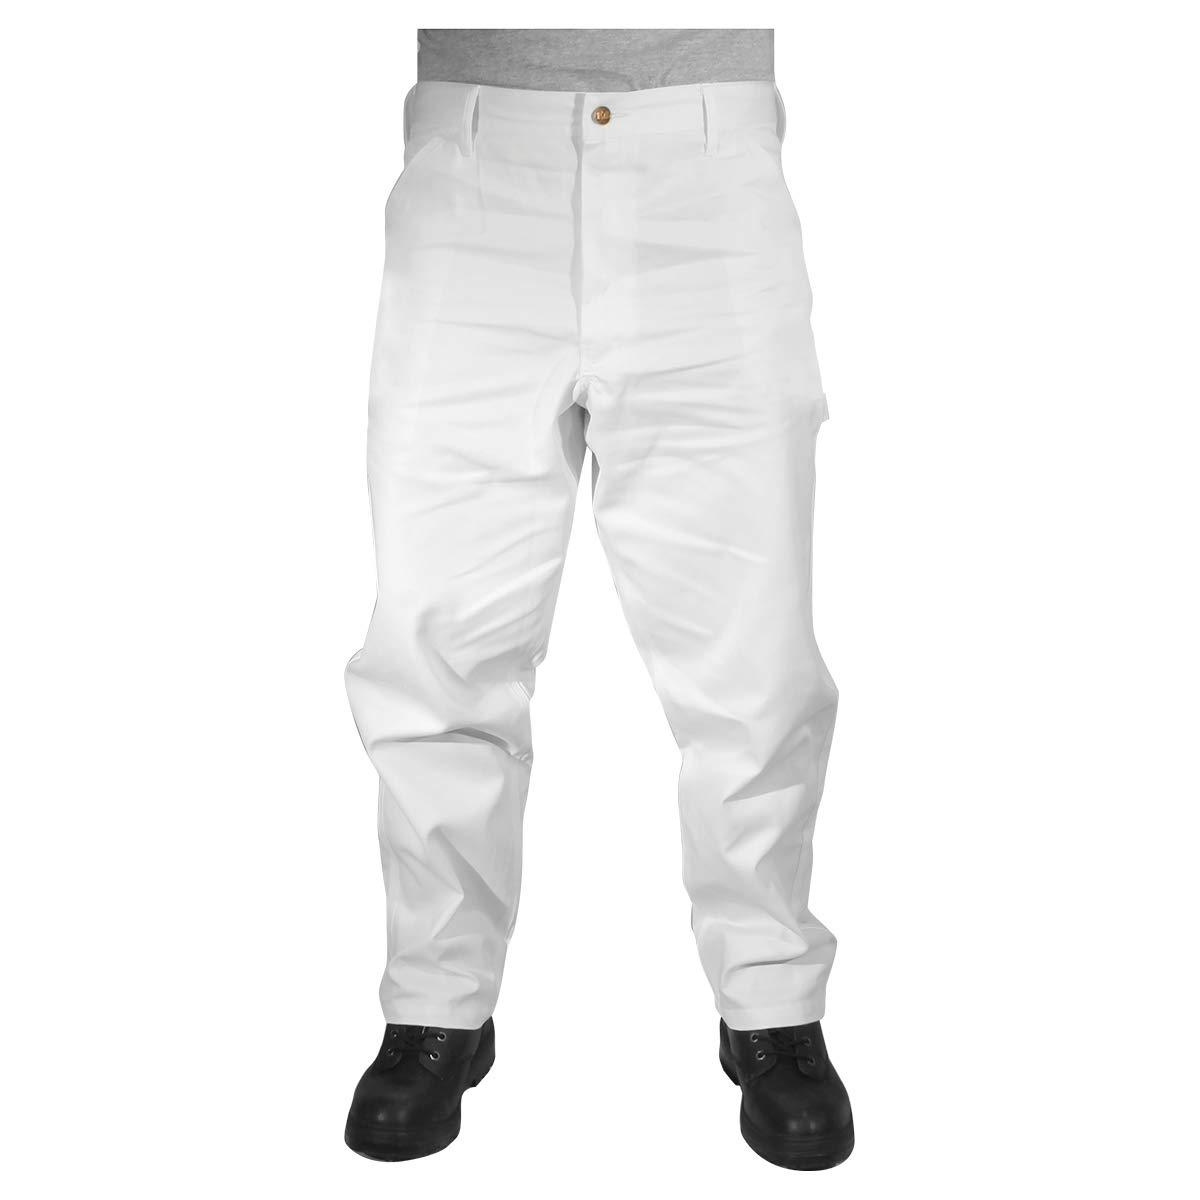 Rugged Blue CSGPTWP1000025167-WHT-38X30 Painters Pants, English, Cotton, 38 x 30 White